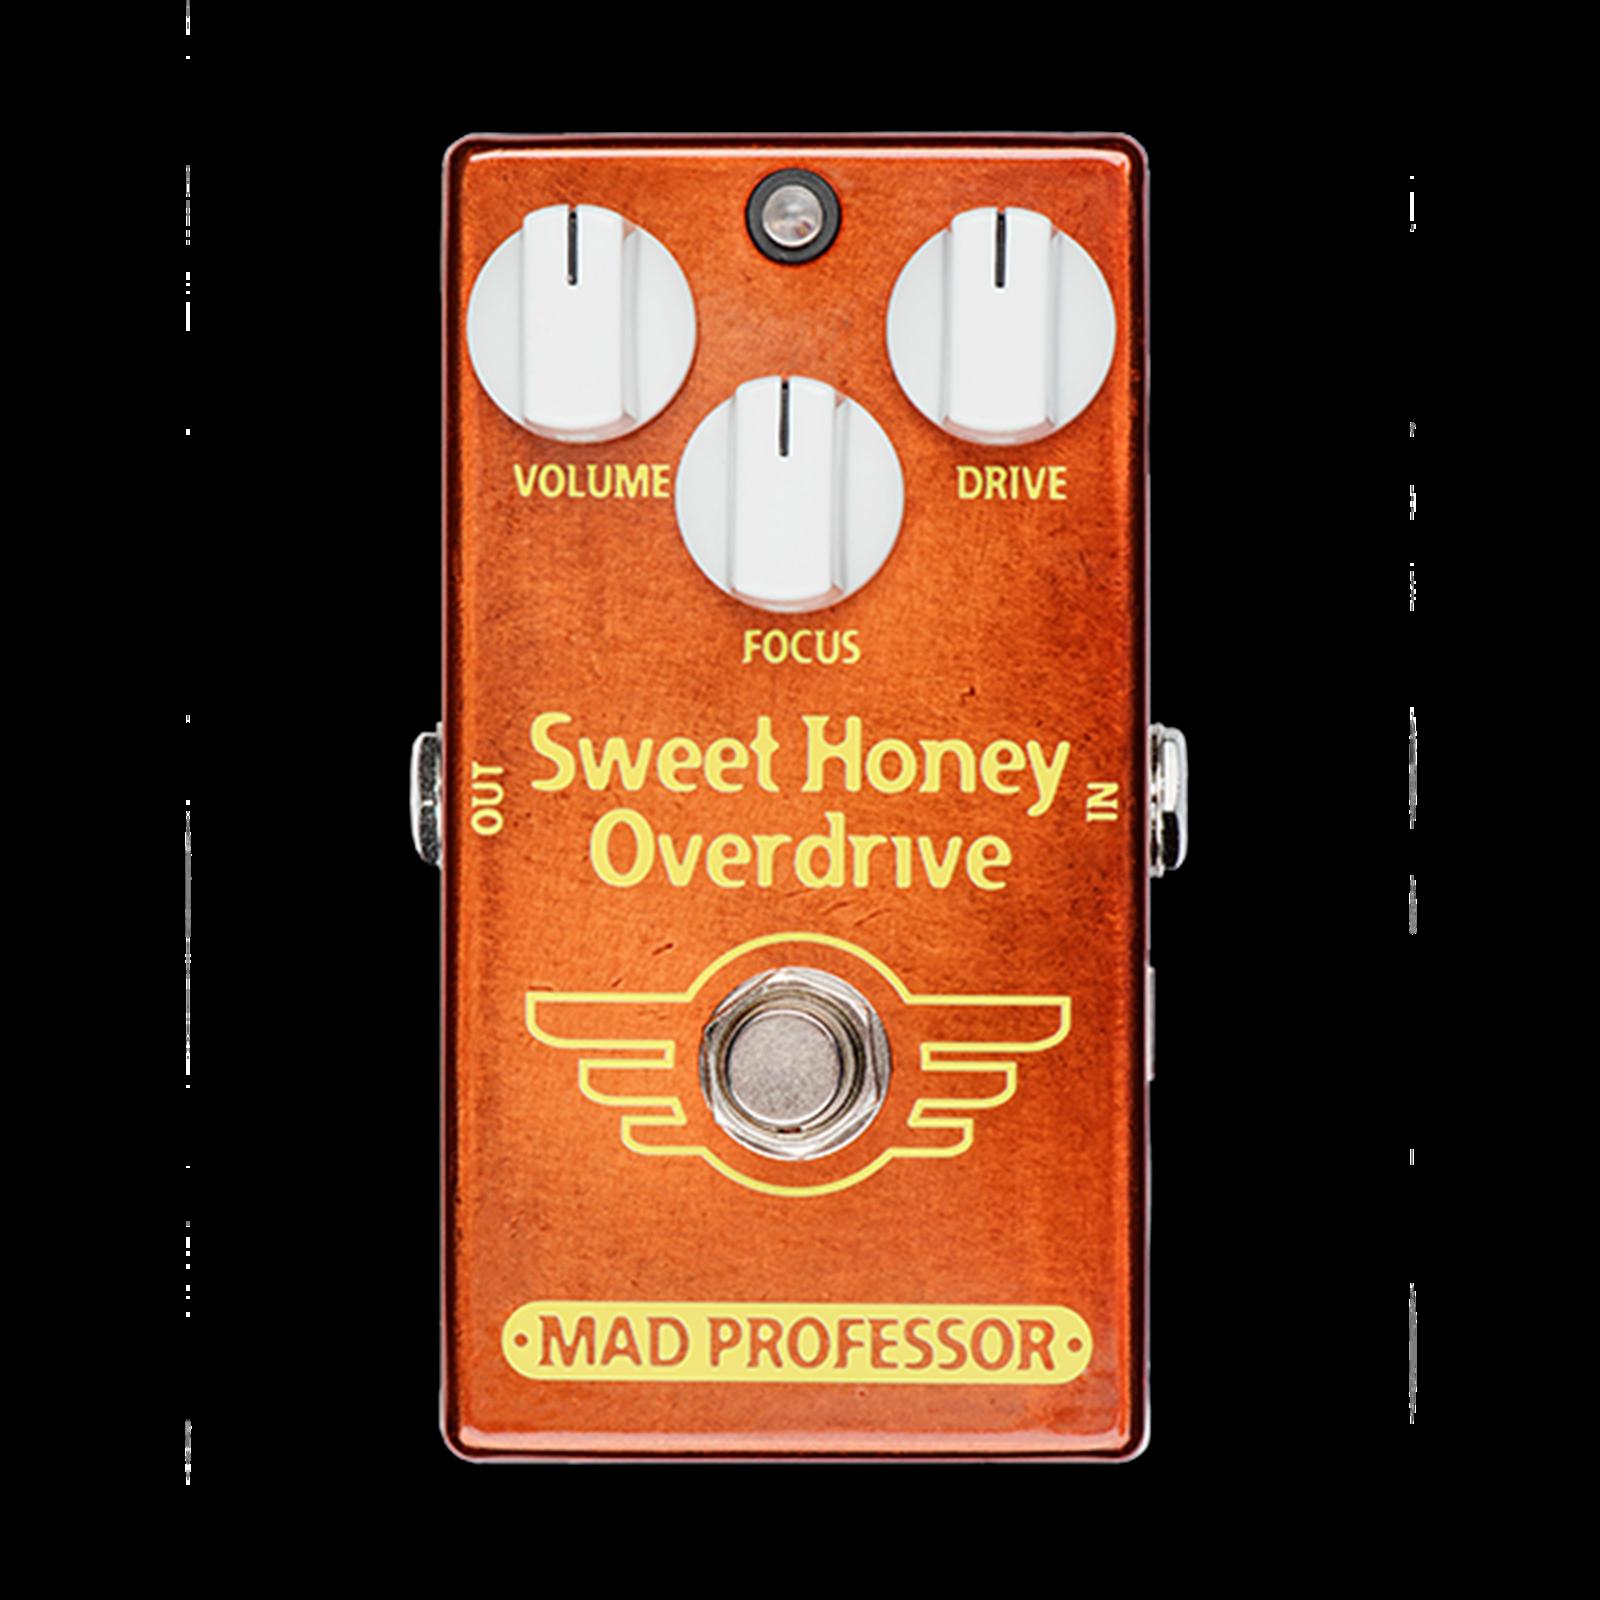 Mad Professor Sweat Honey Overdrive